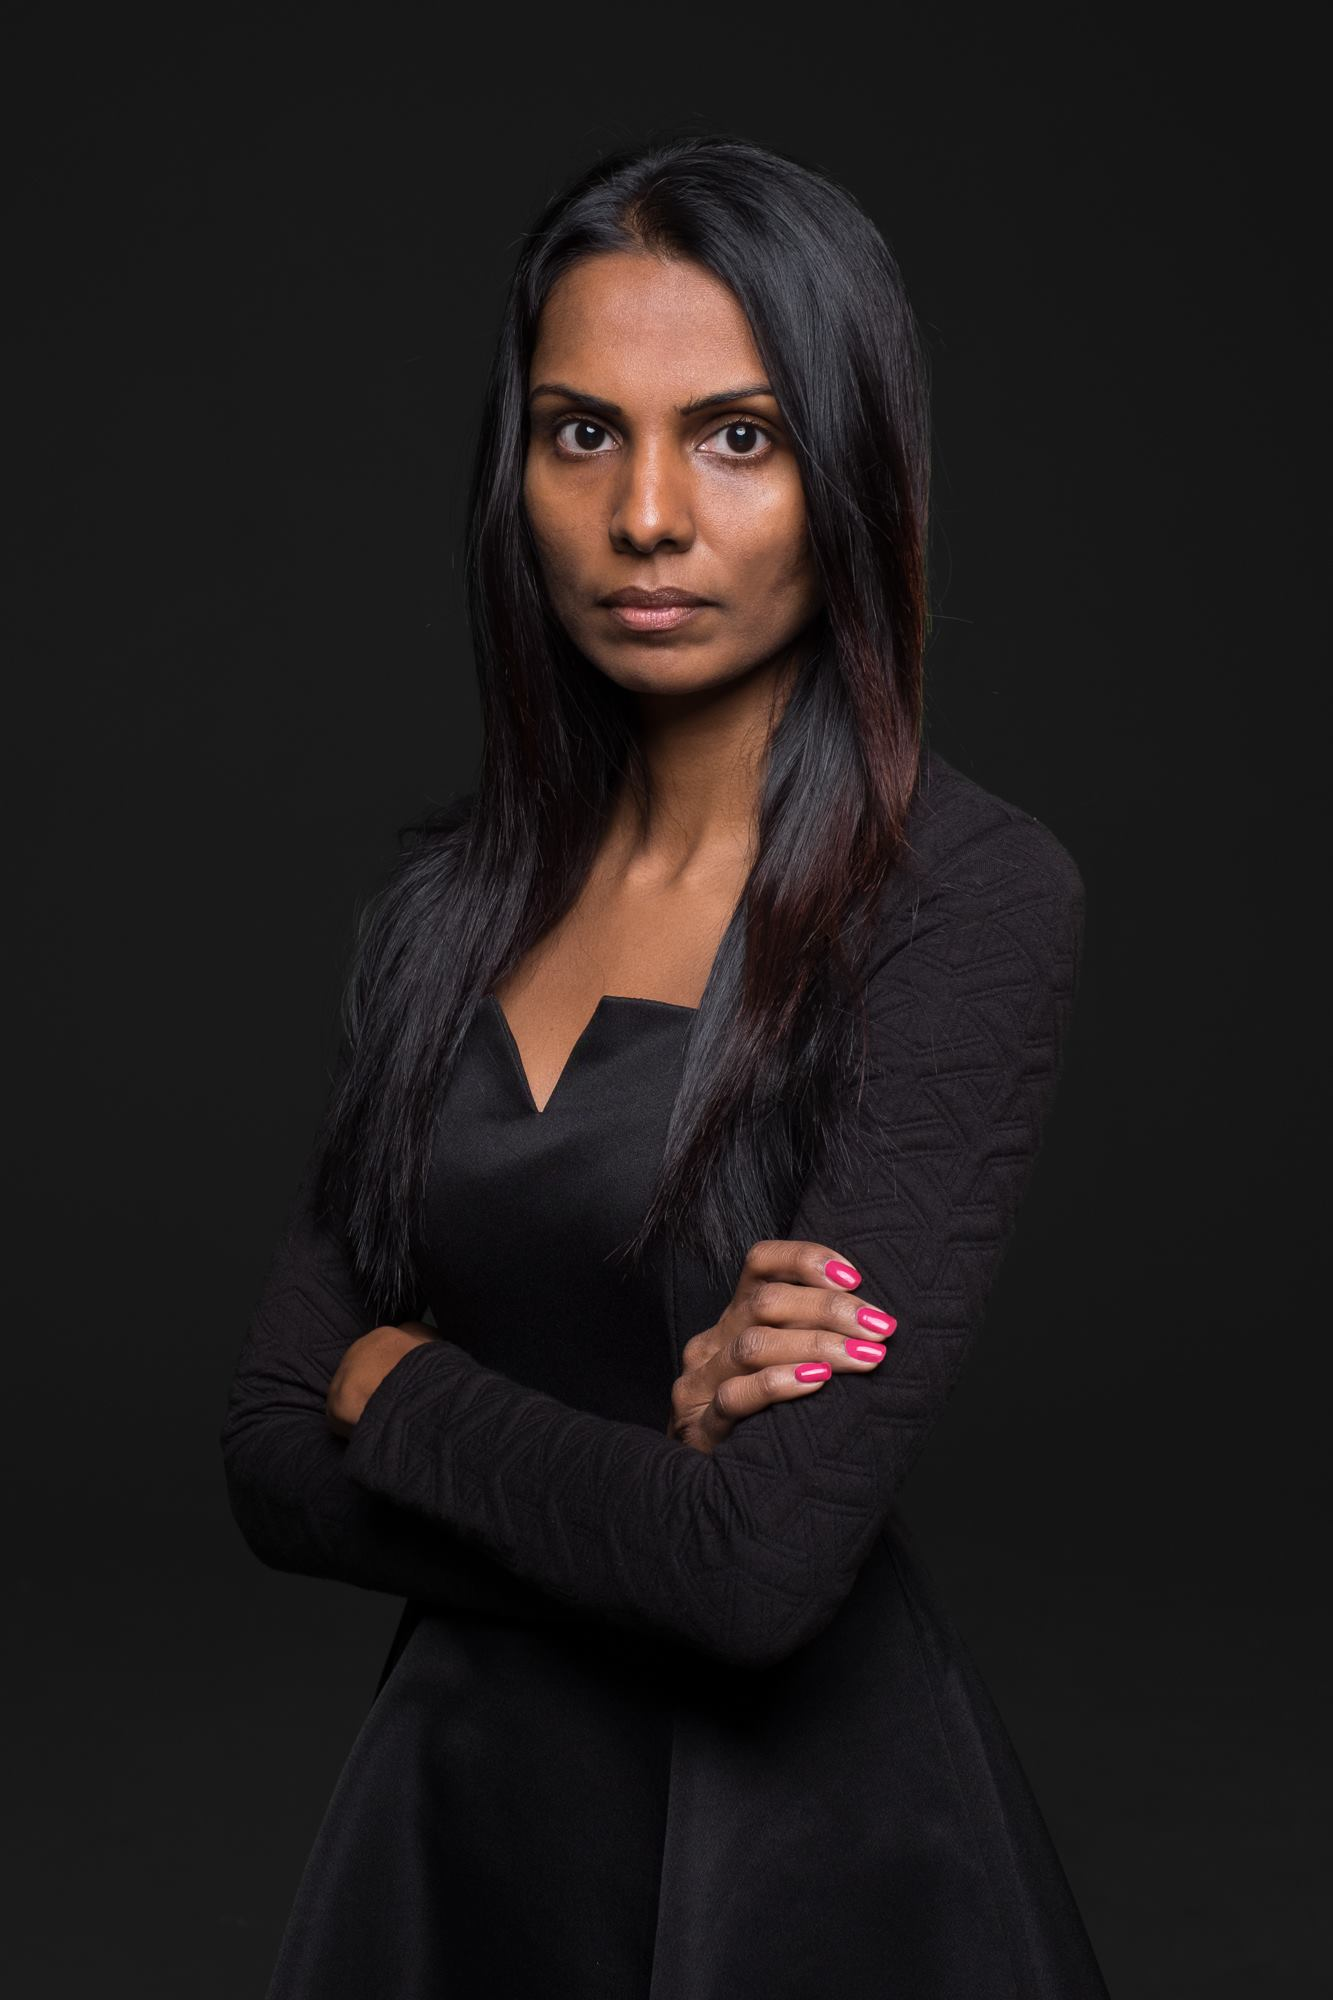 Corporate headshot portrait linkedin profil photography studio singapore services asia photographer shanthi jeuland coco pr